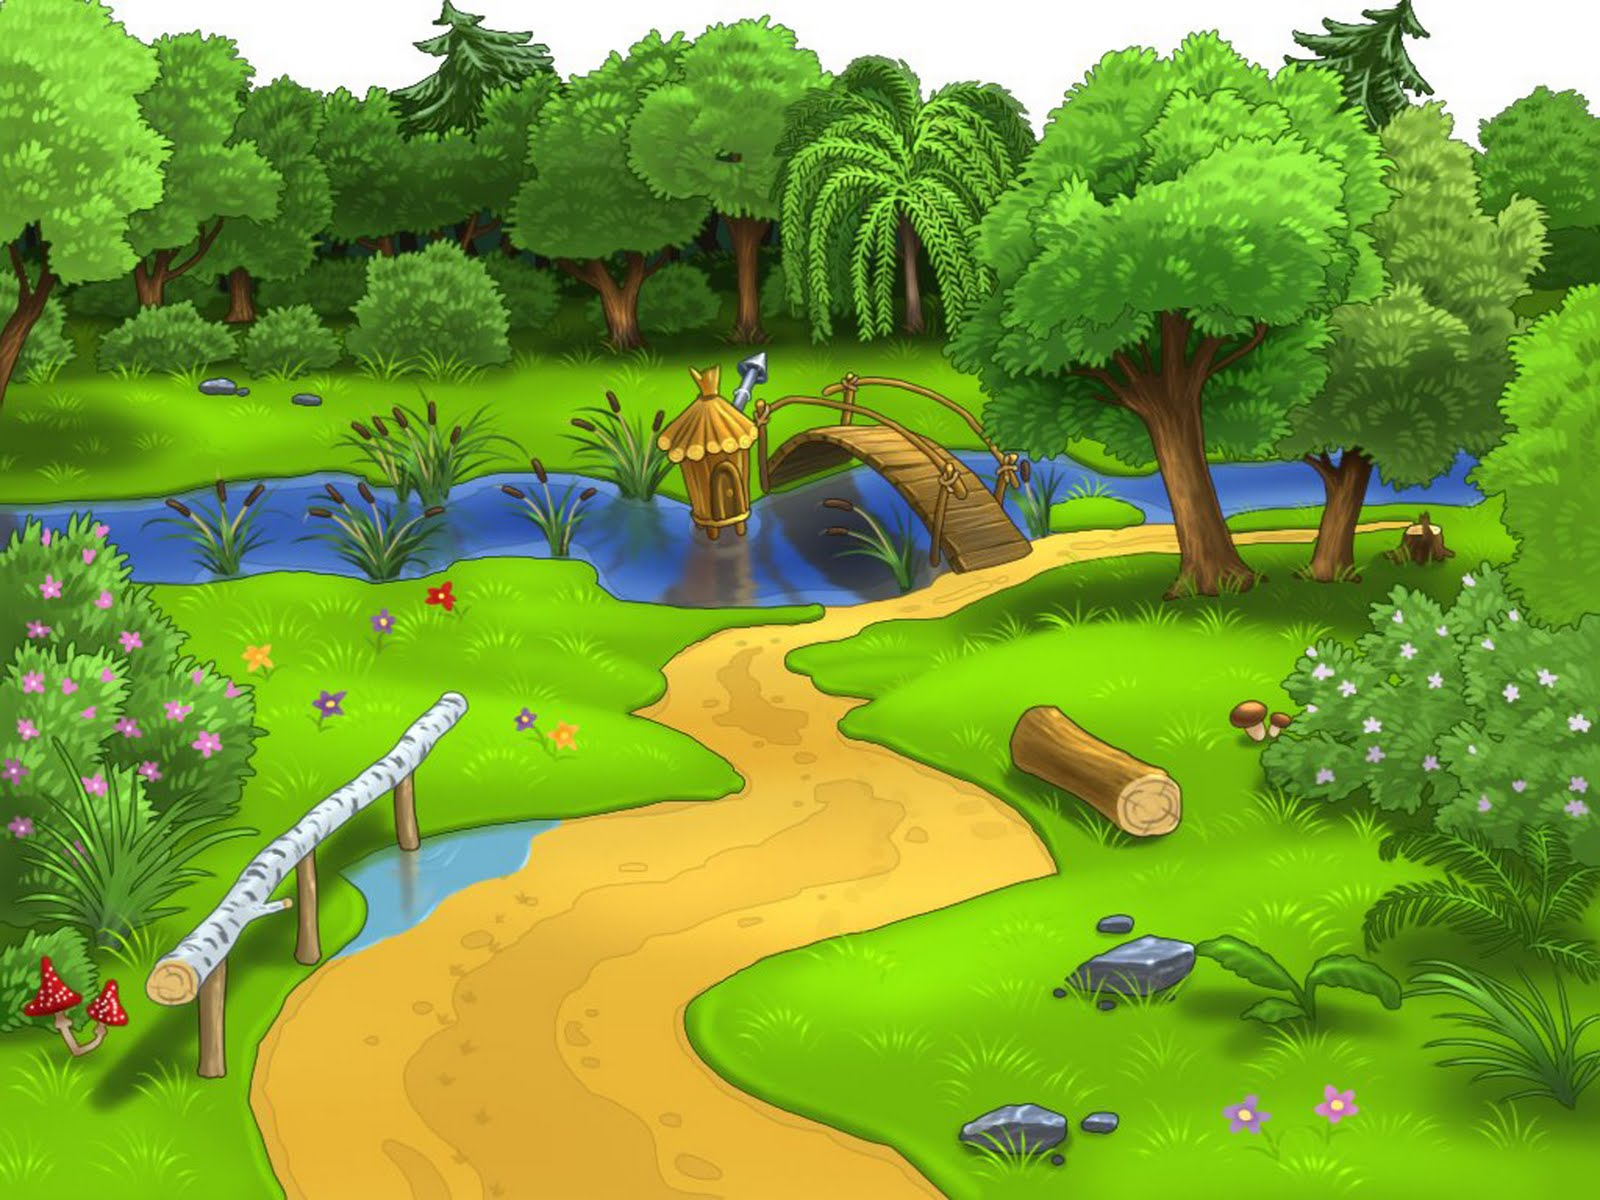 Marcos gratis para fotos paisajes infantiles for Buscar fondo de pantallas gratis